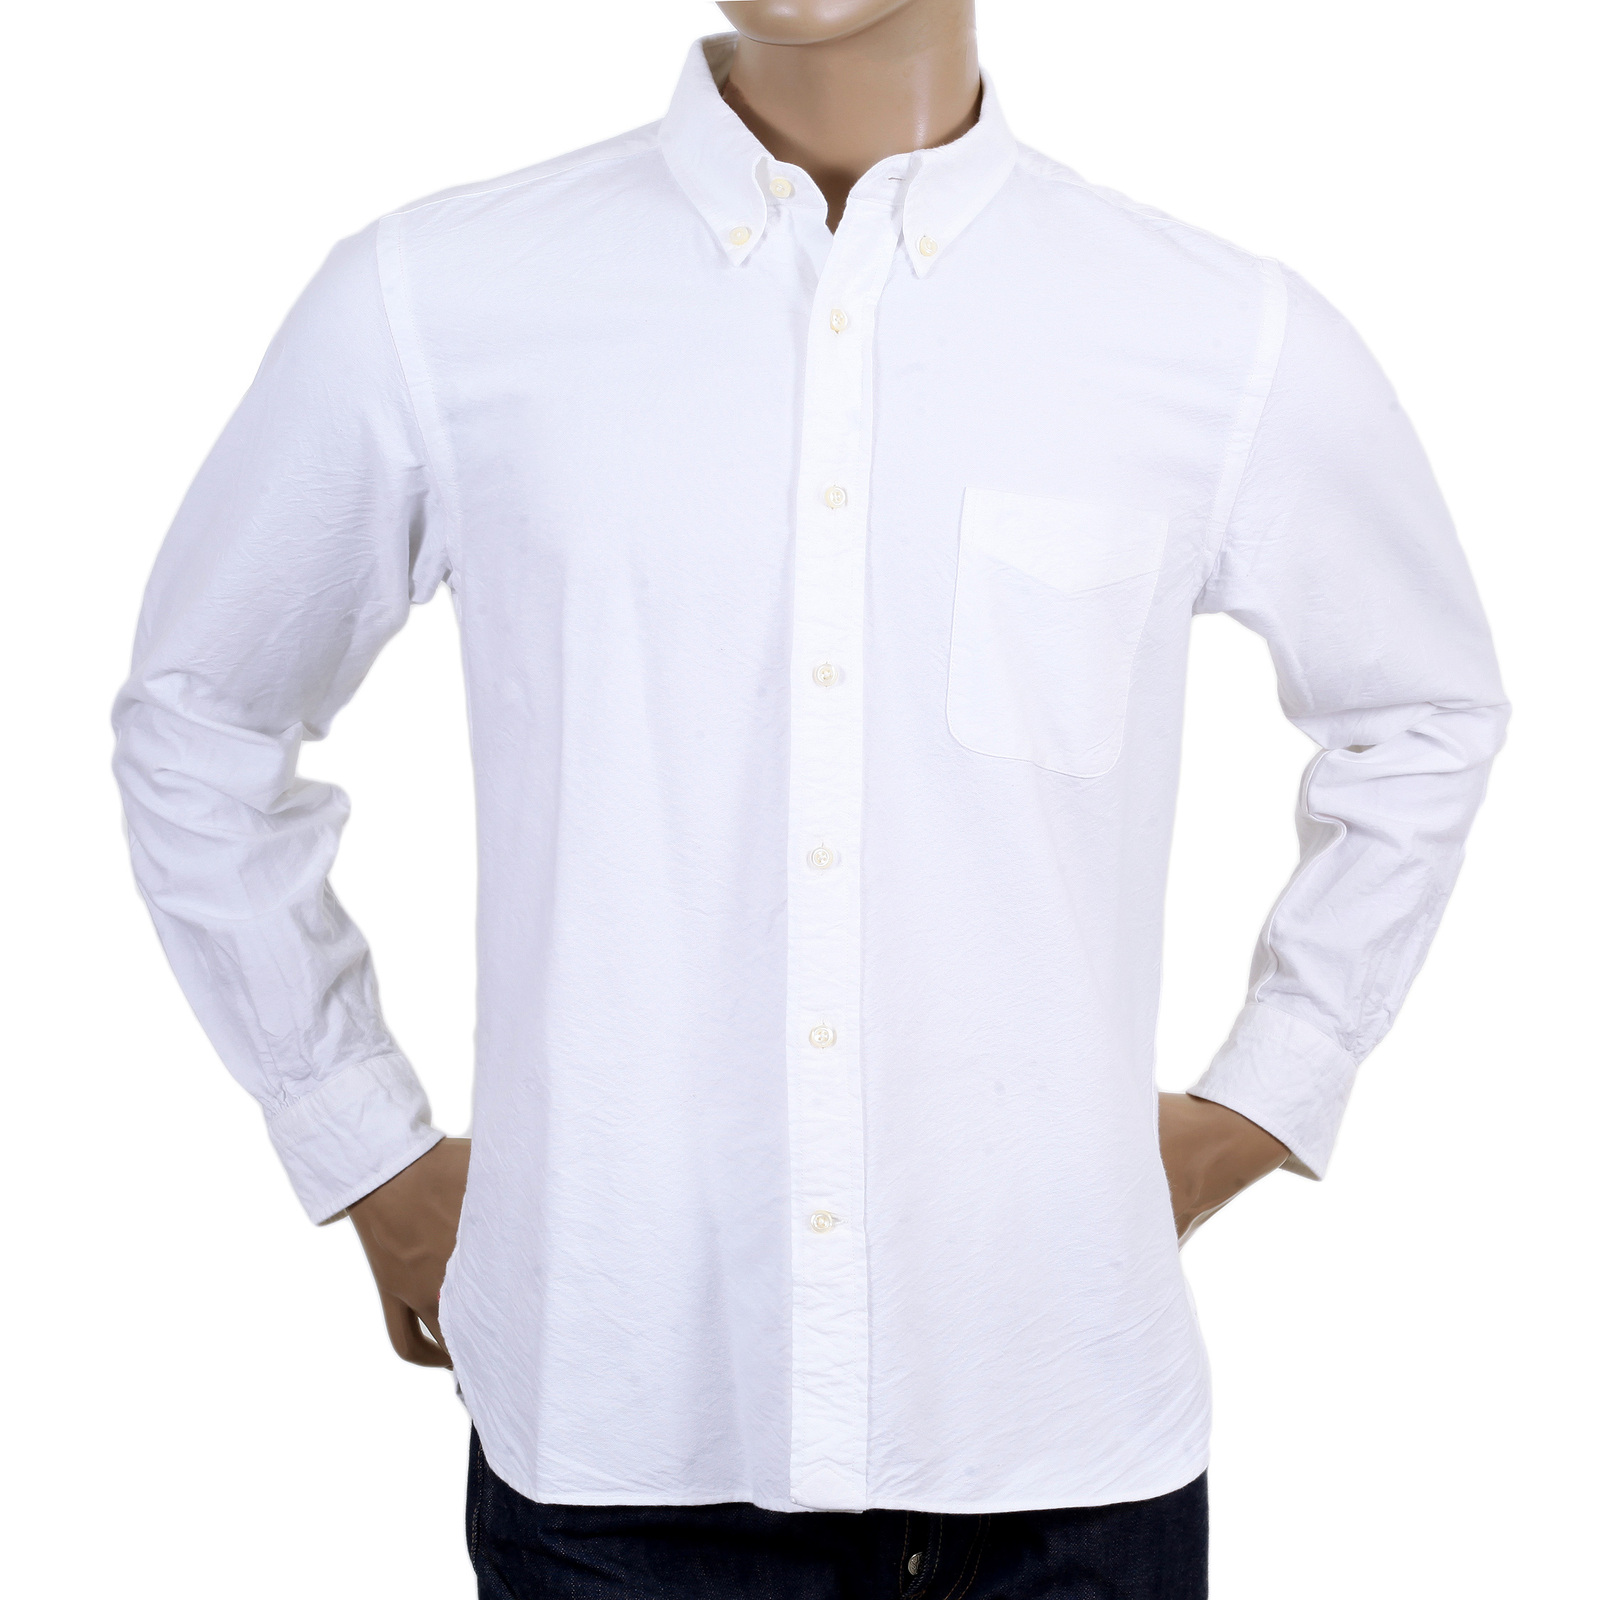 Shop for oxford sugar cane button down off white shirt for White button down oxford shirt